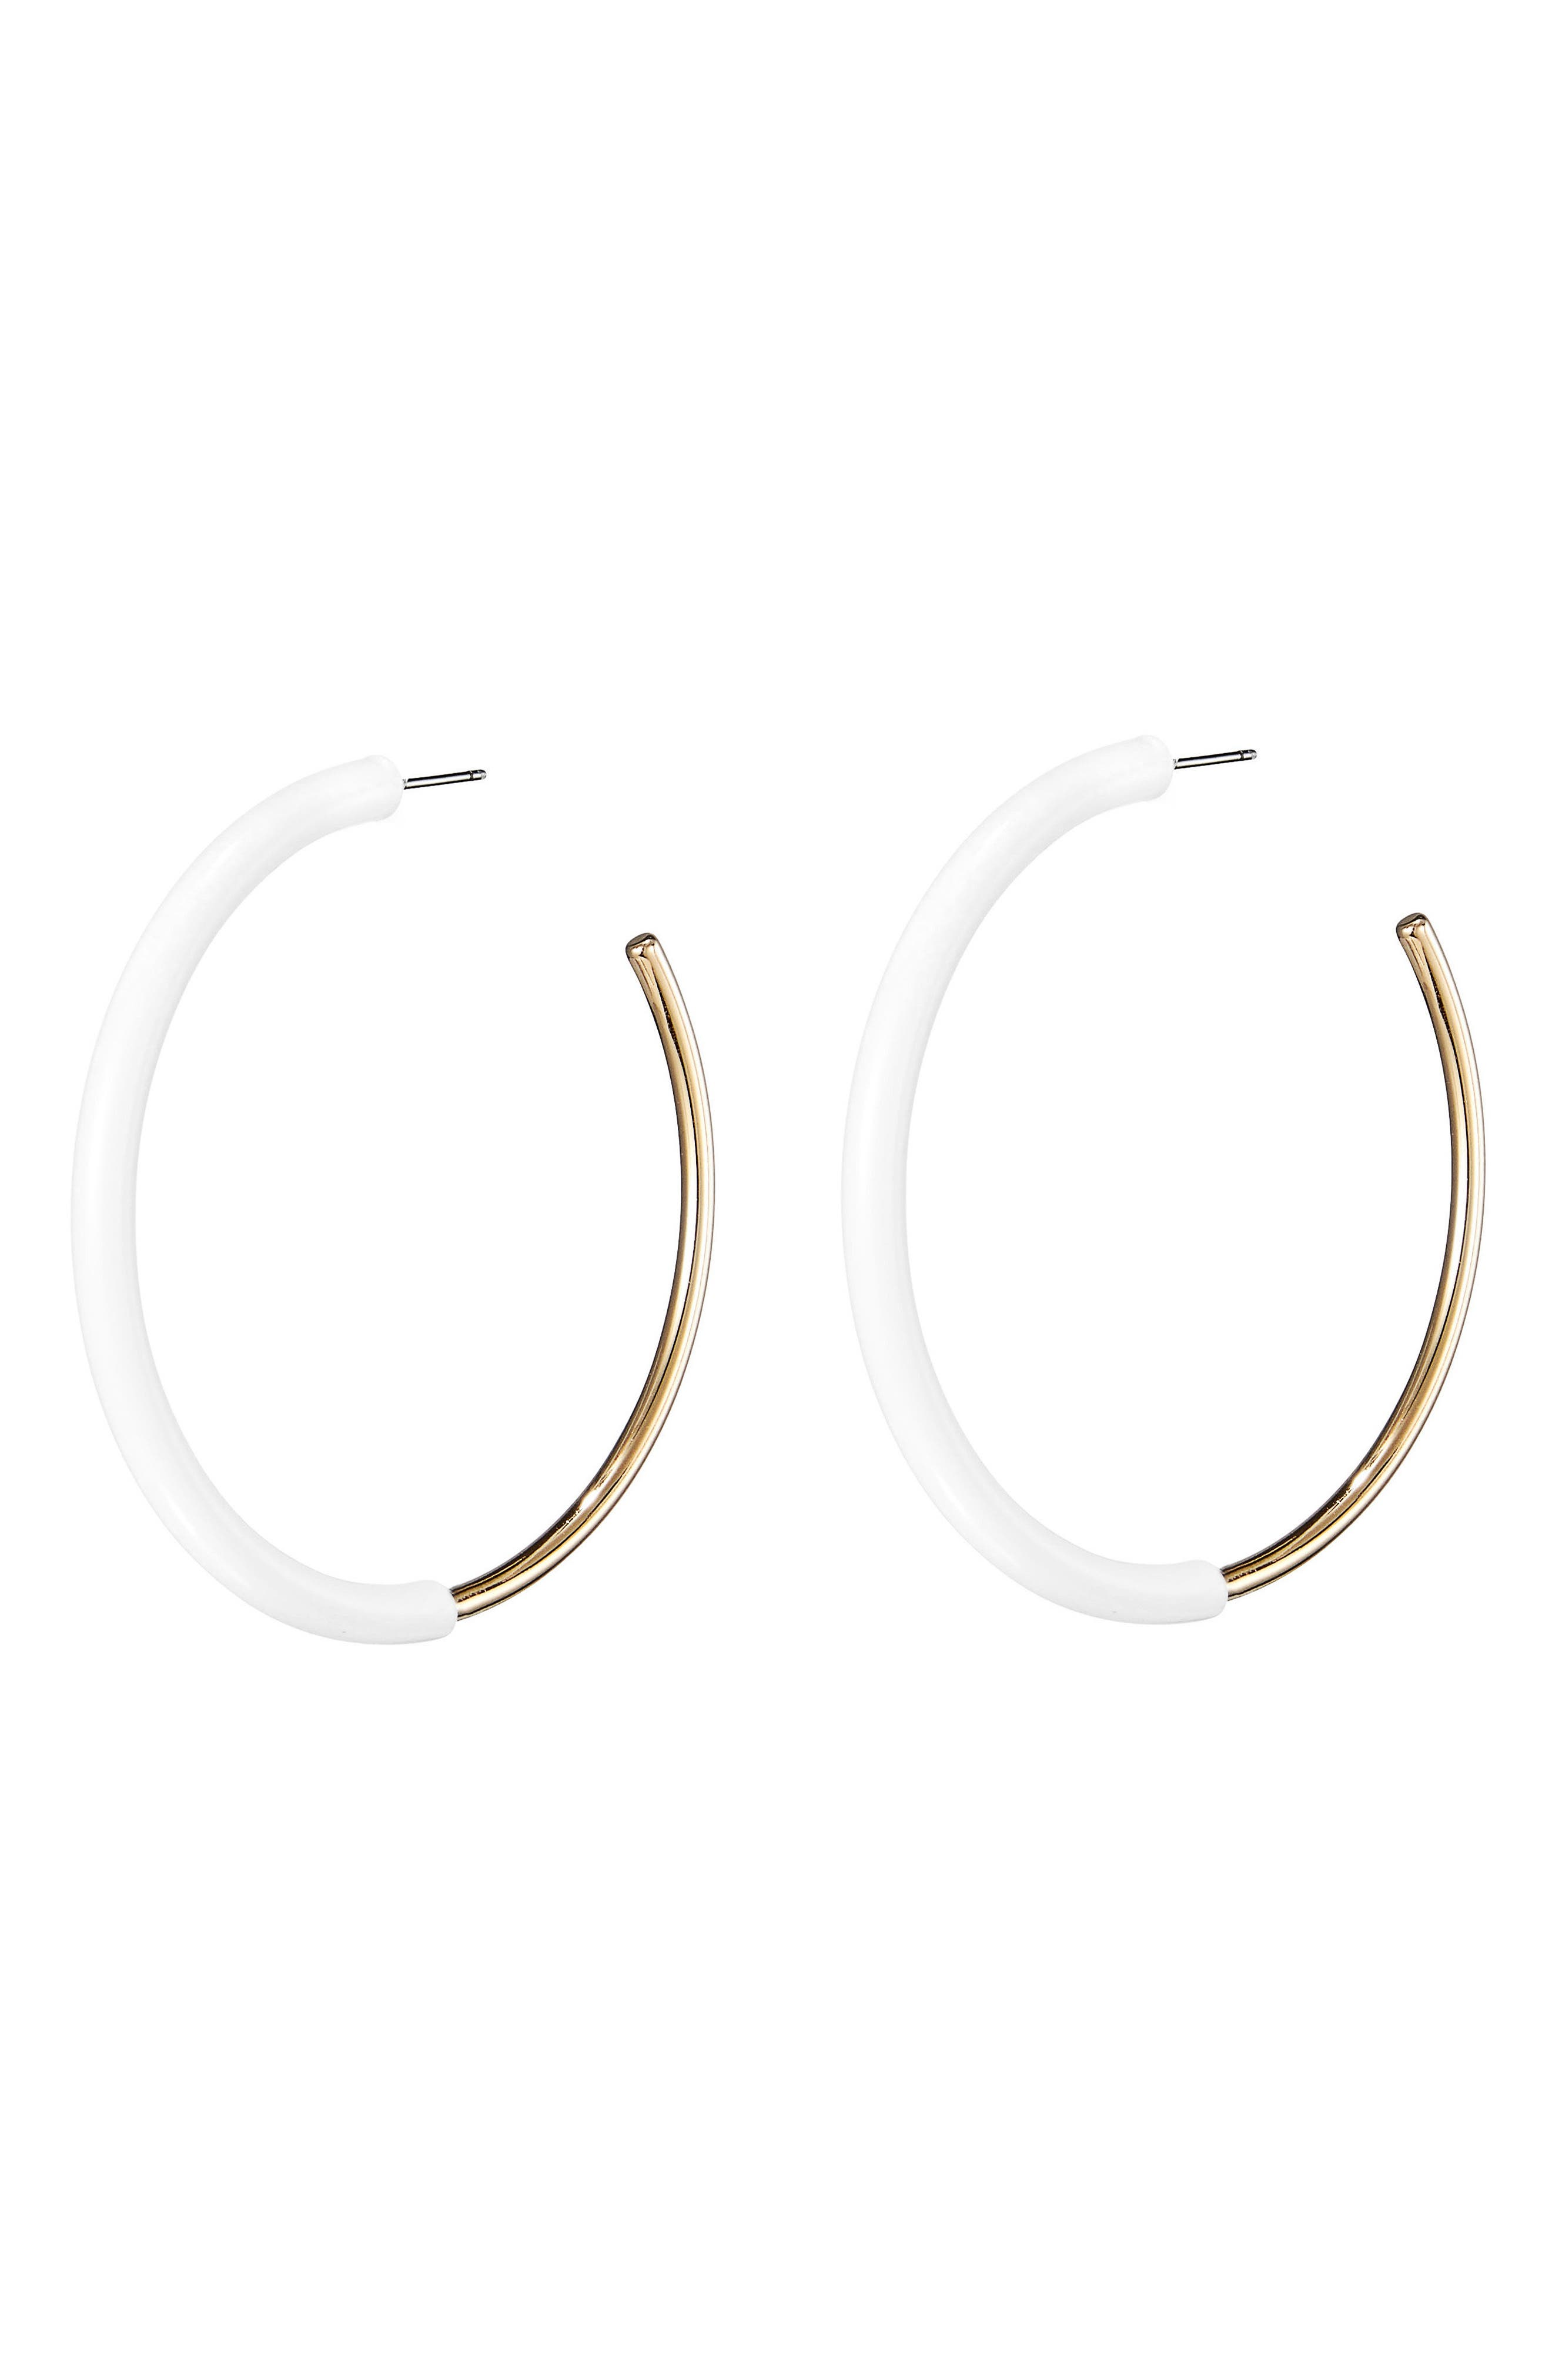 Lola Small Hoop Earrings,                         Main,                         color, 100